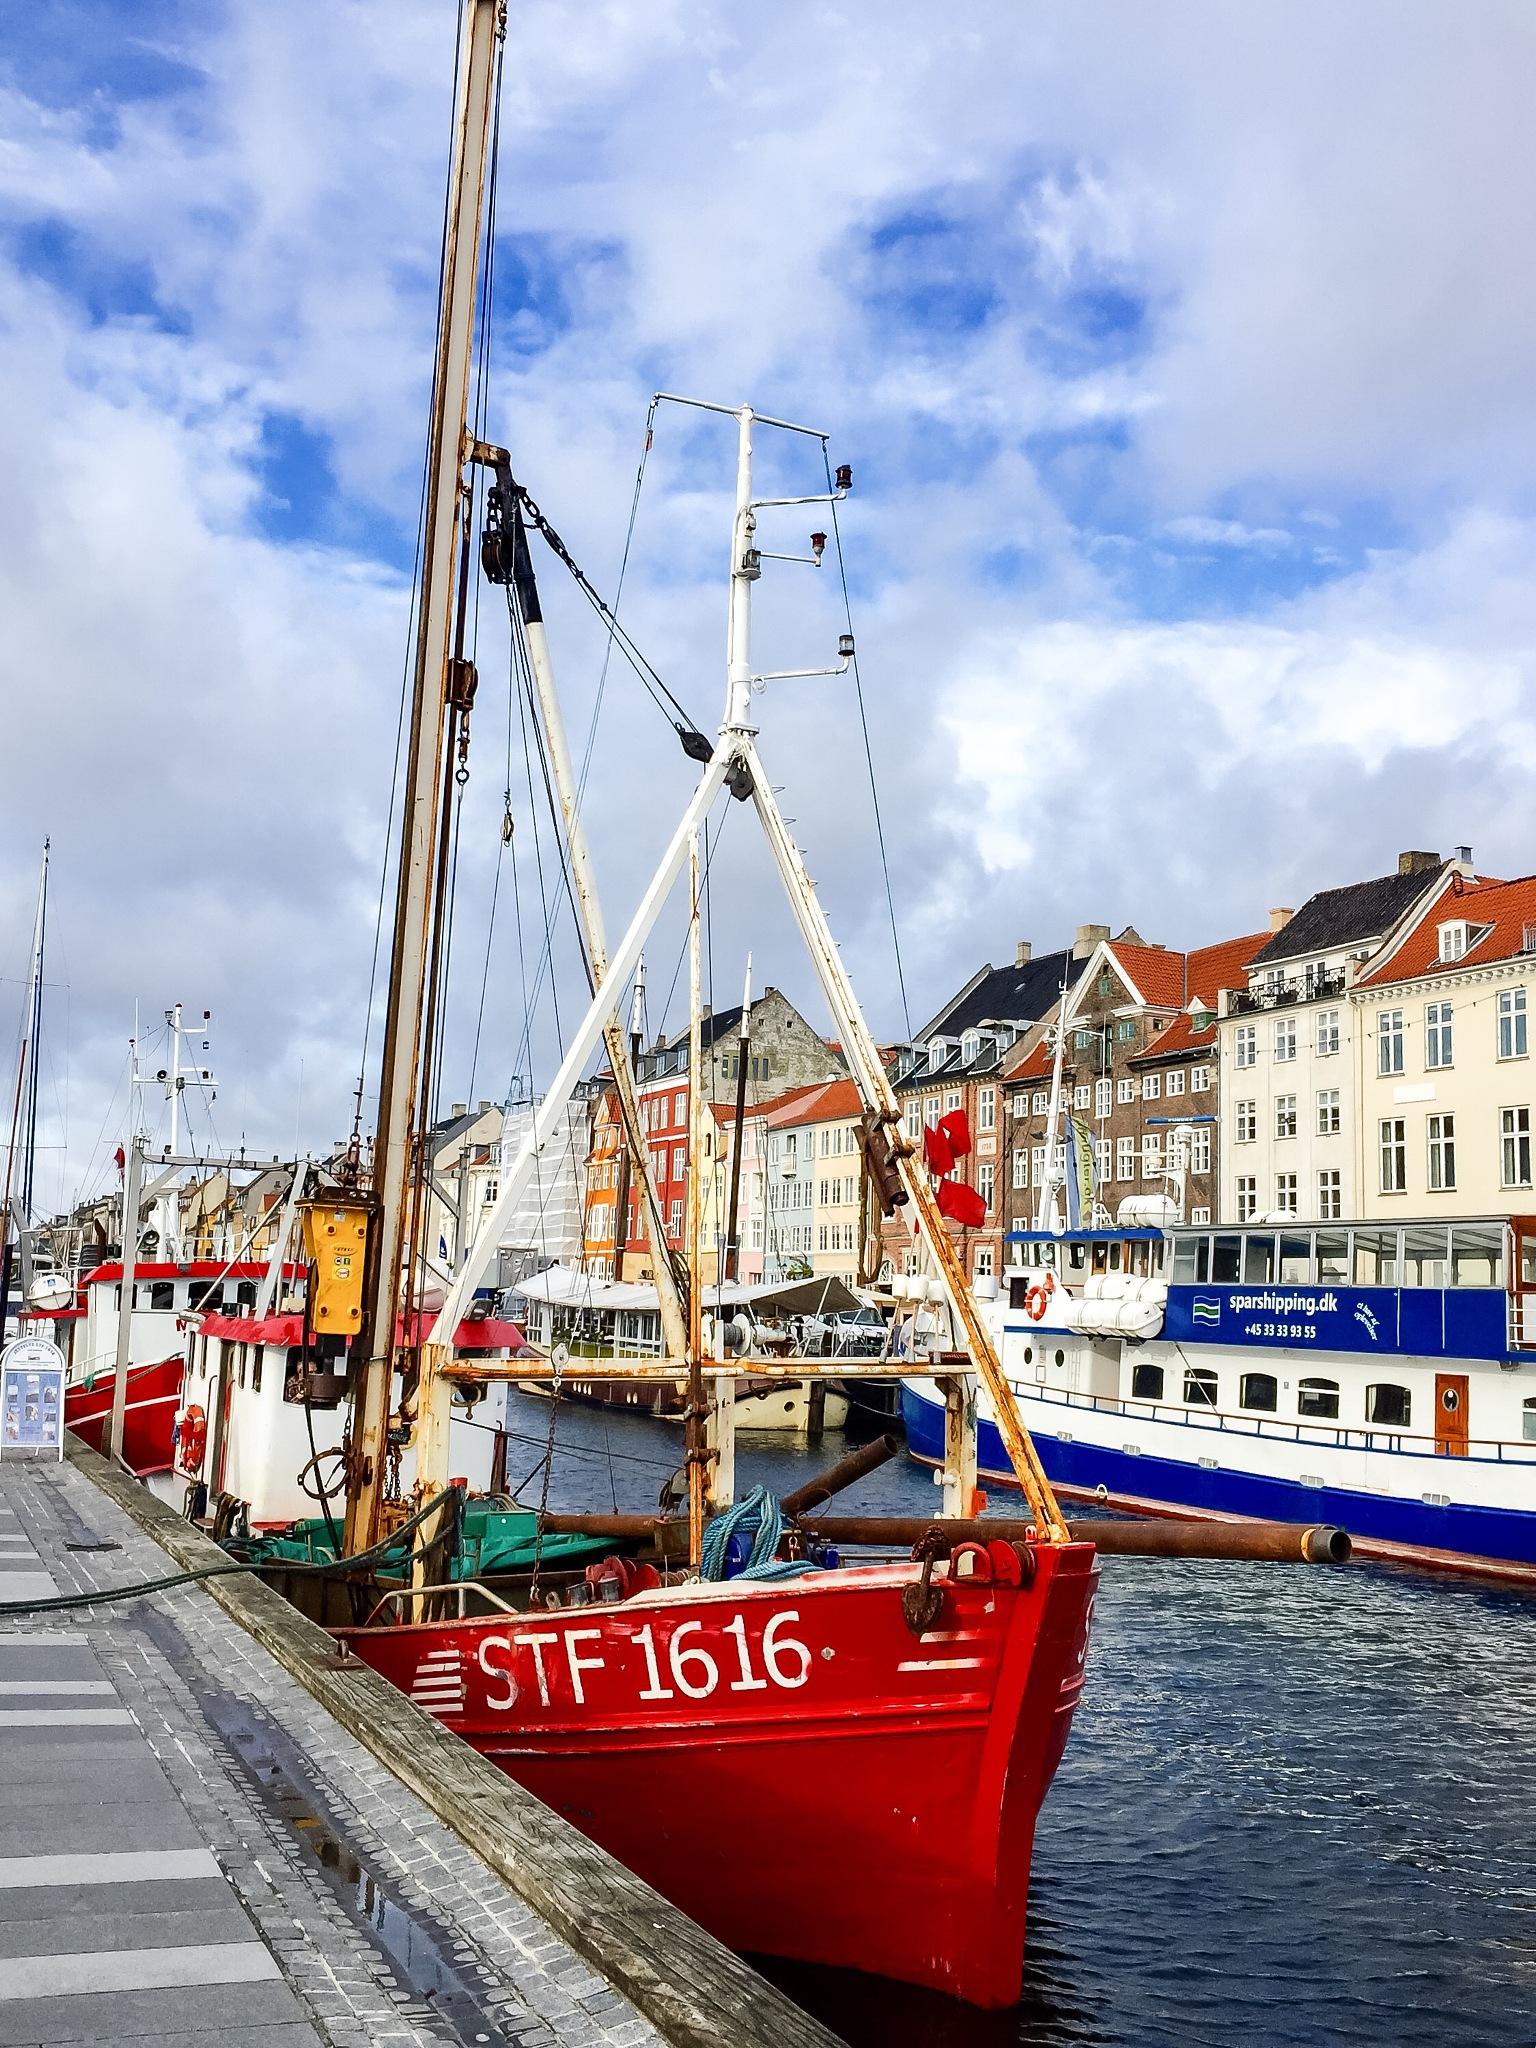 ... fra en lille gåtur i København i dag  ... from a little walk today in Copenhagen   by Jan Lauridsen